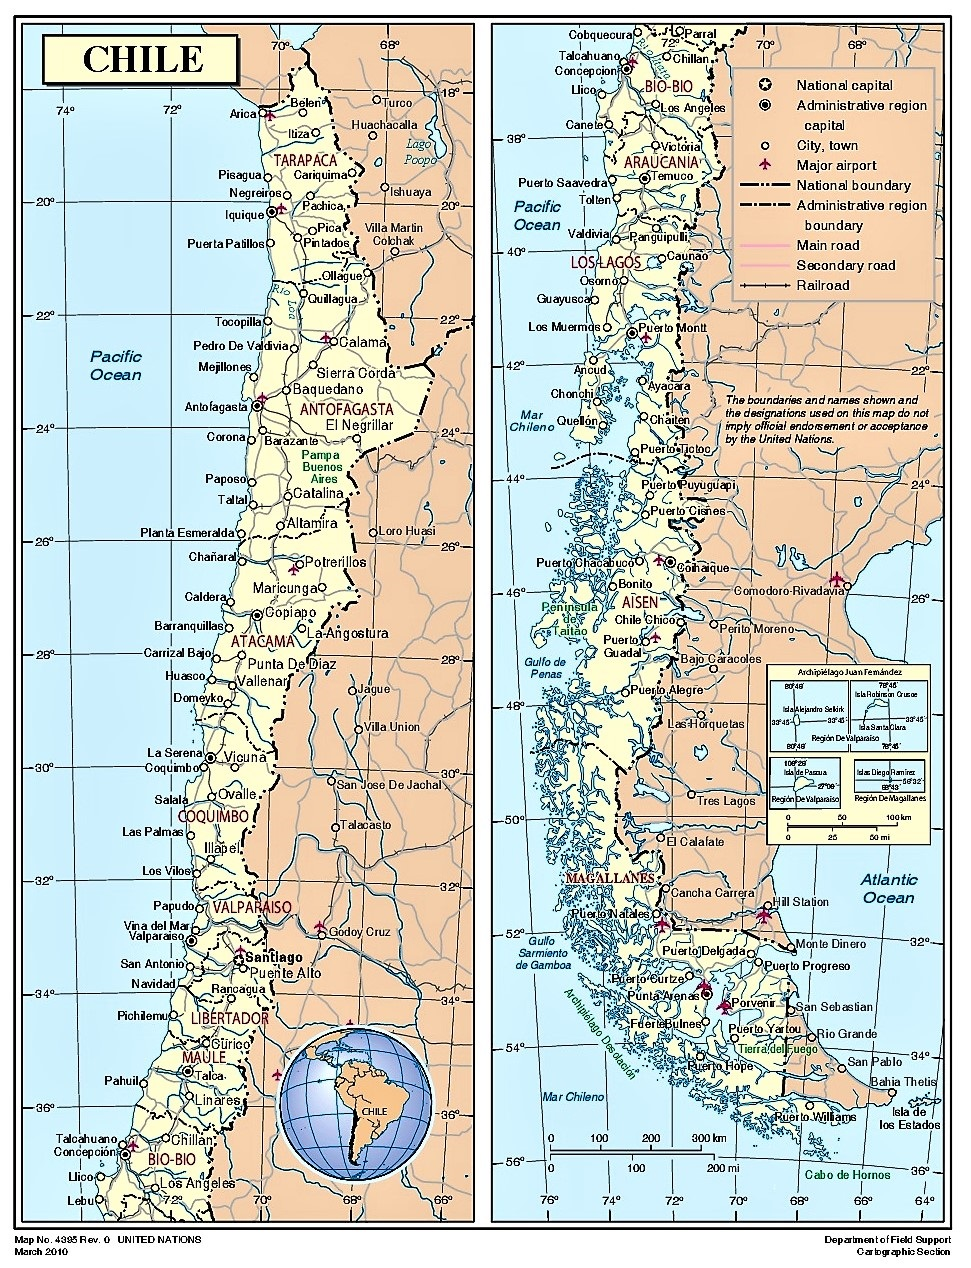 Mapa Sur De Chile.Mapa De Chile Politico Fisico Imprimir Colorear O Pintar 2020